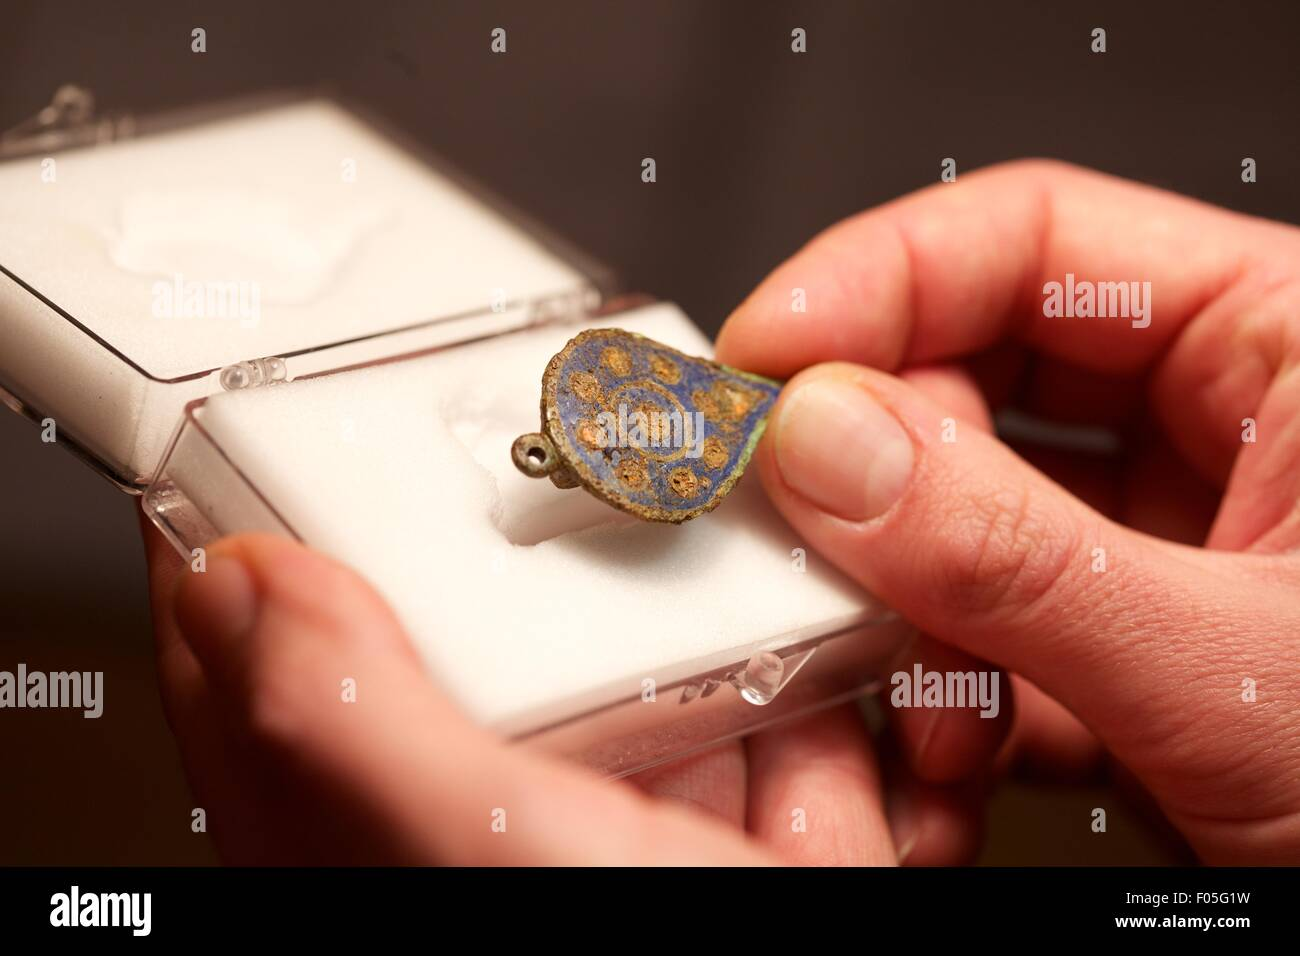 close up shot of hands holding artefact - Stock Image